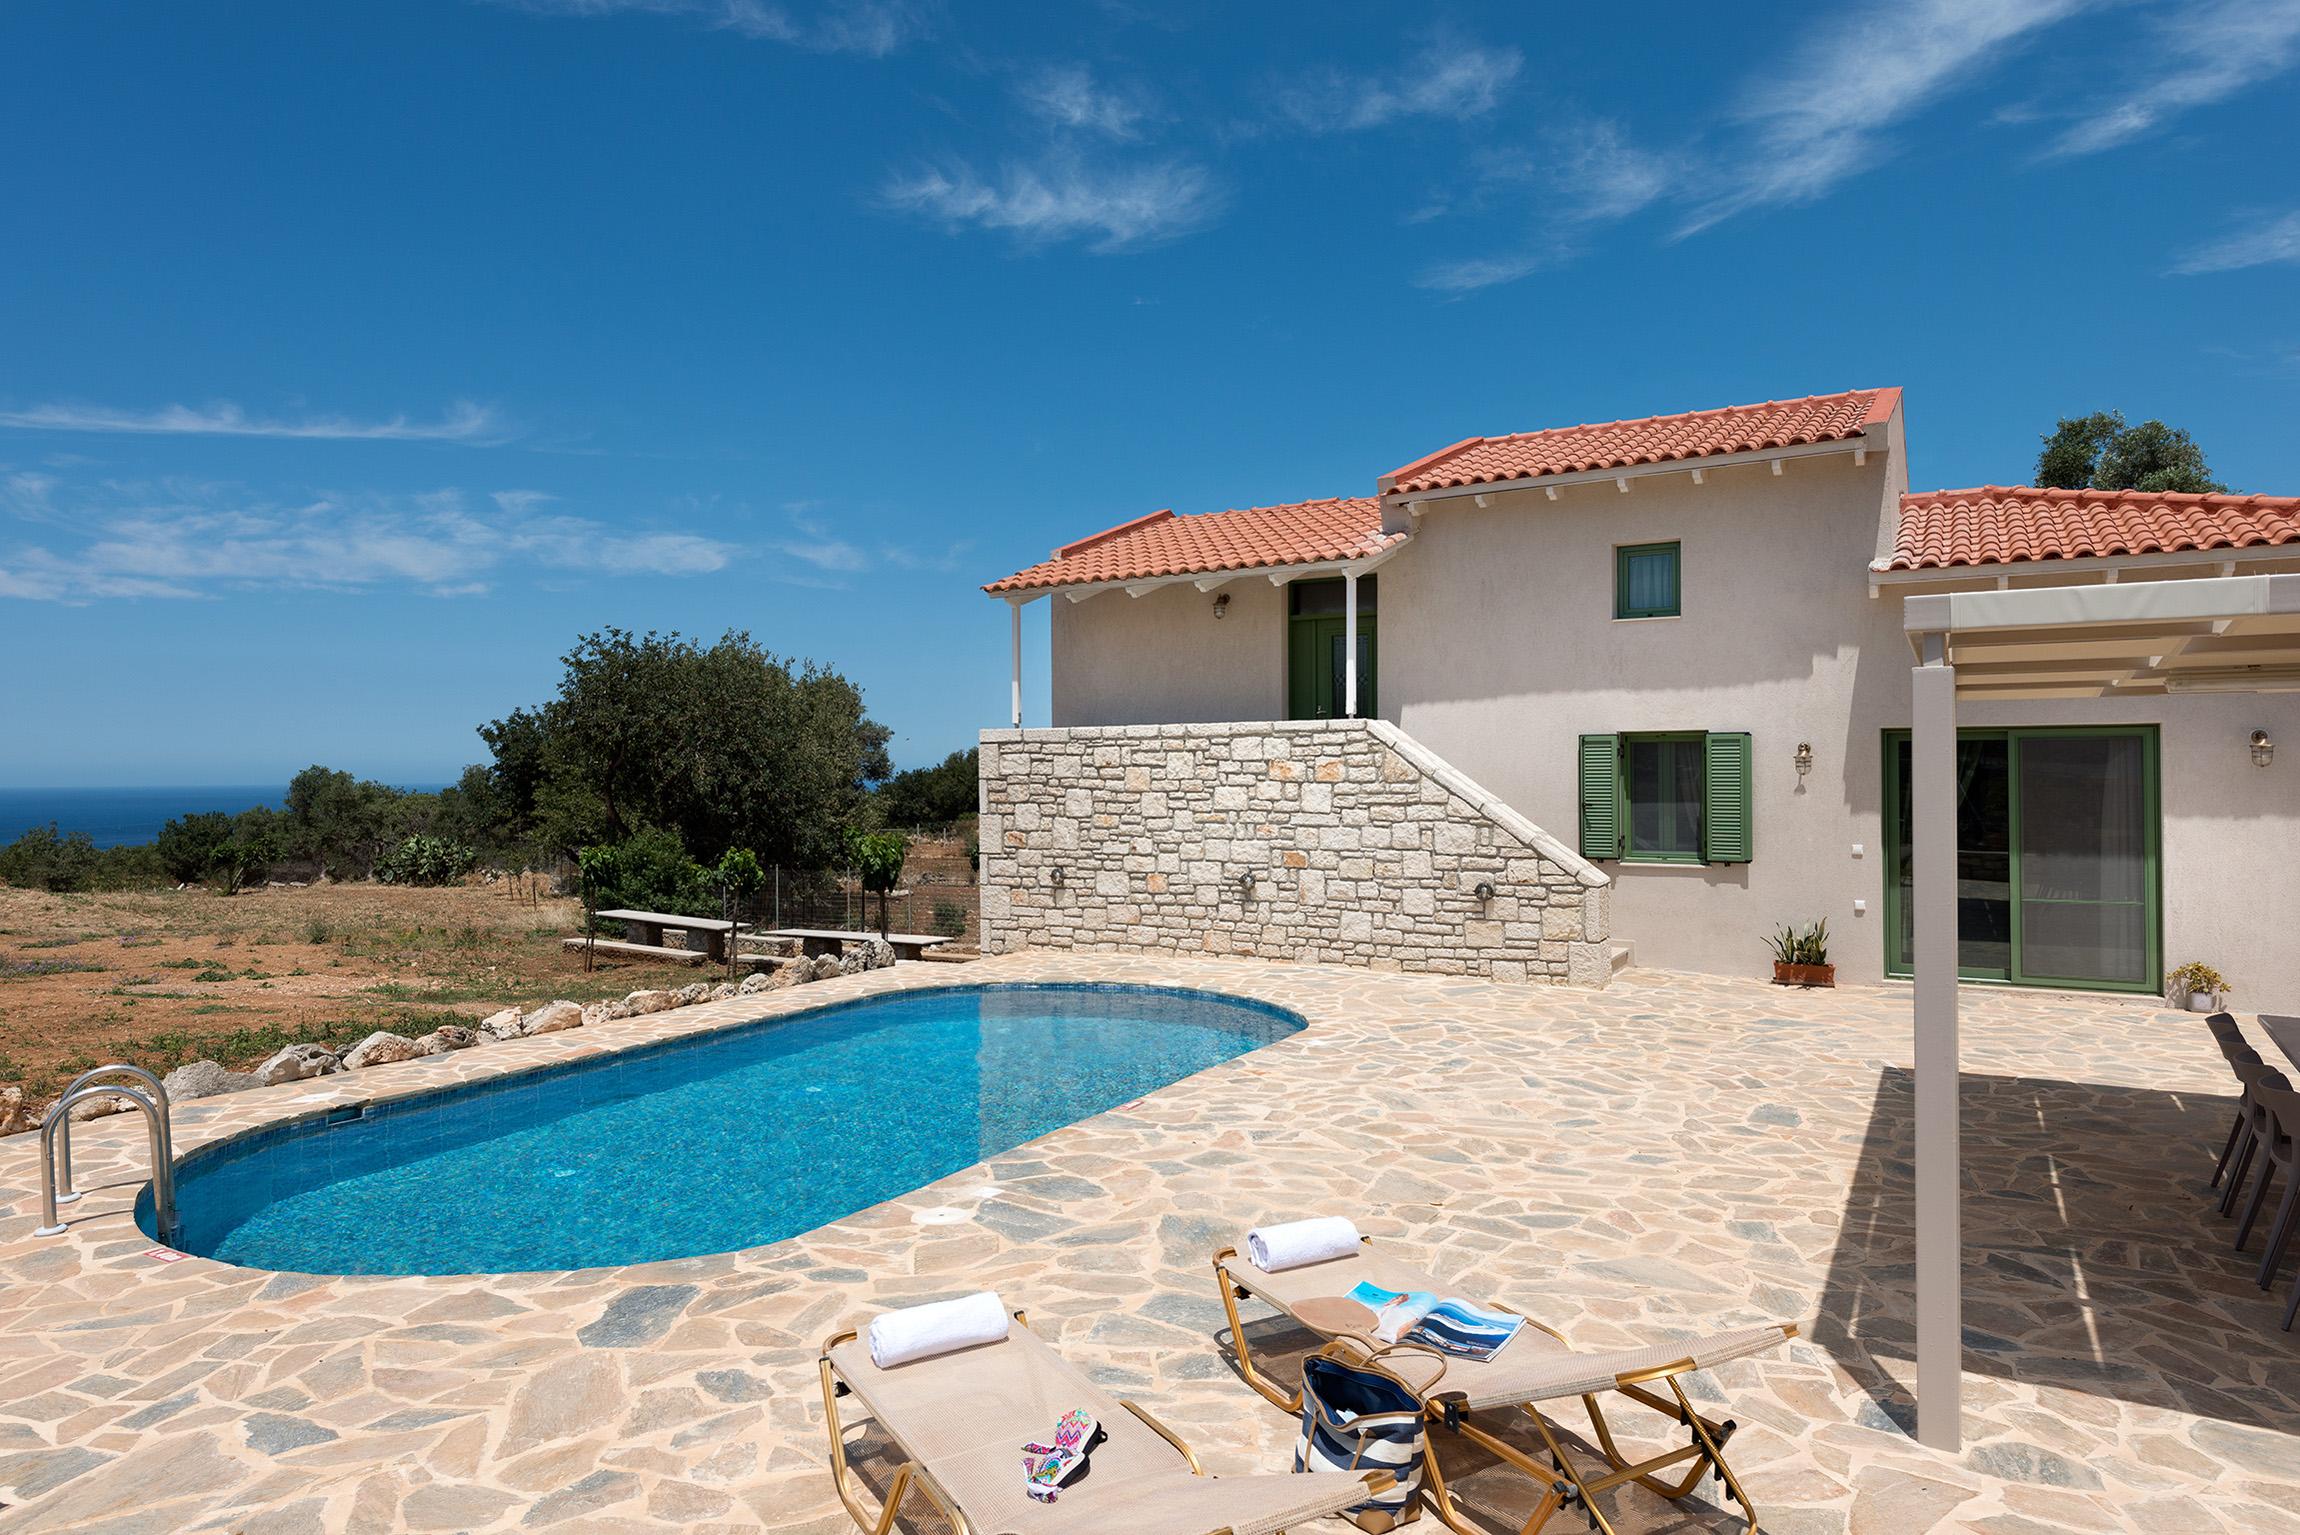 forest-villas-crete-sarpedon-swimming-pool.jpg